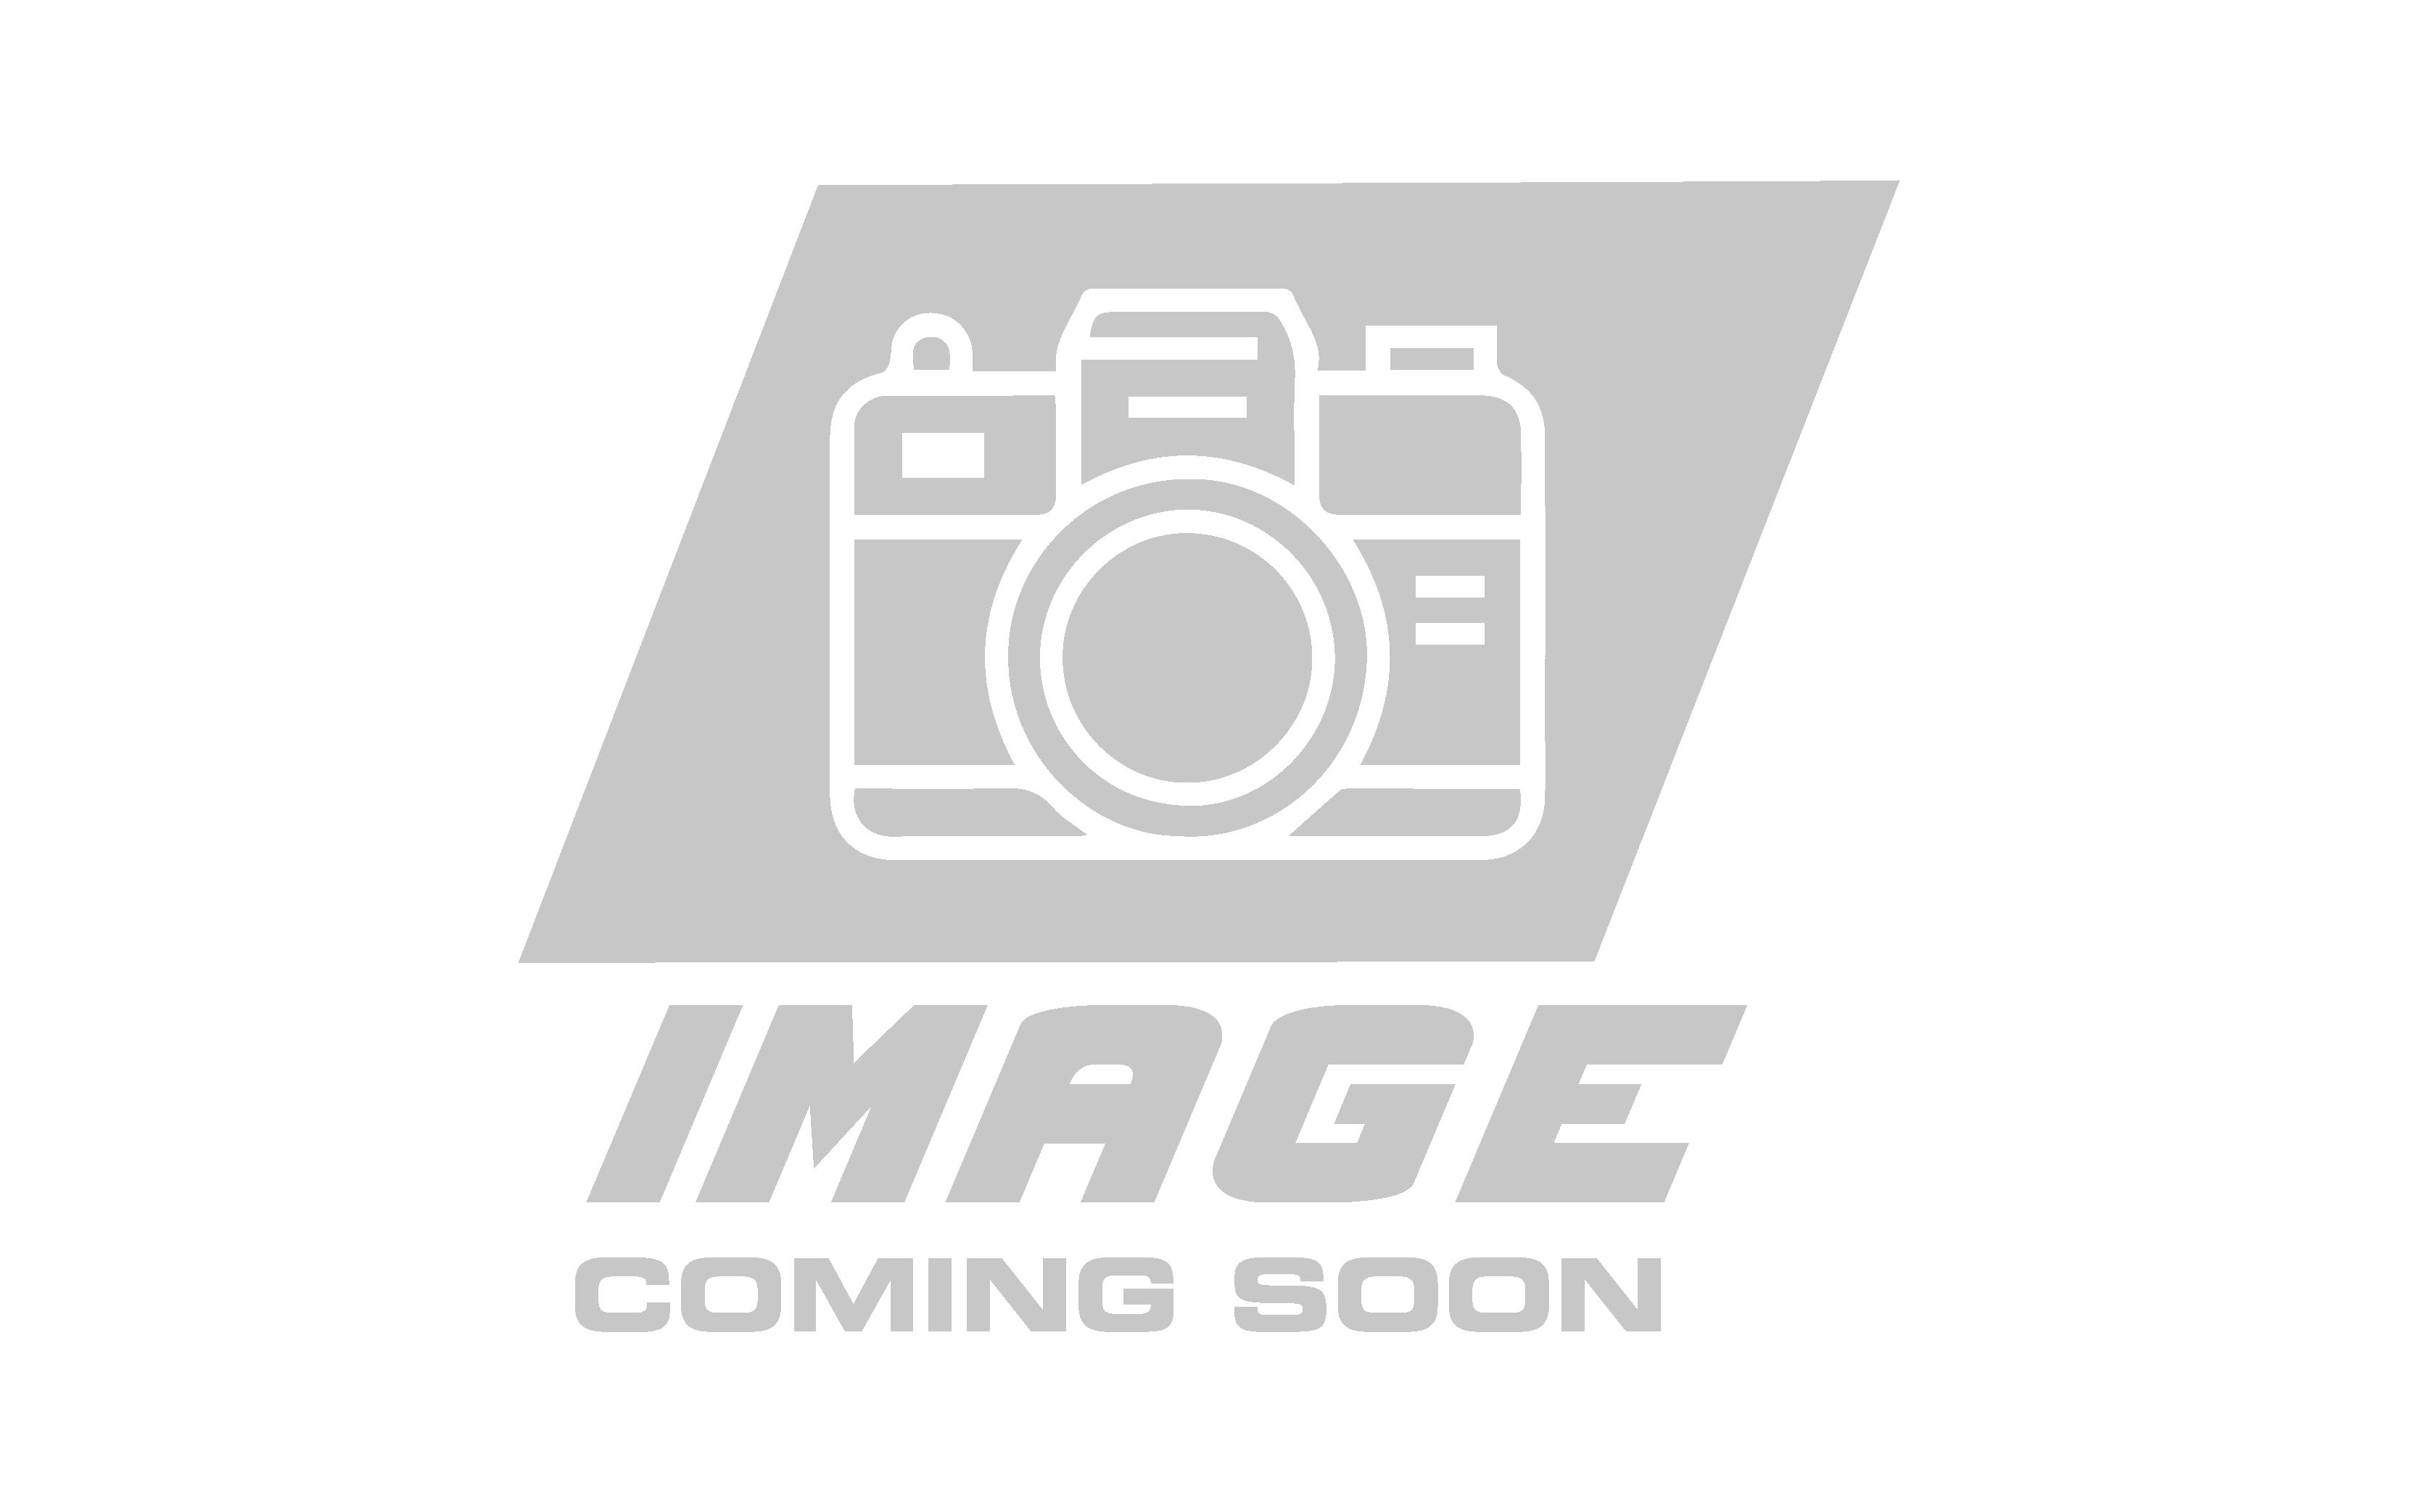 ford_f250_f350_f450_air_lift_loadlifter_5000_ultimate_bag